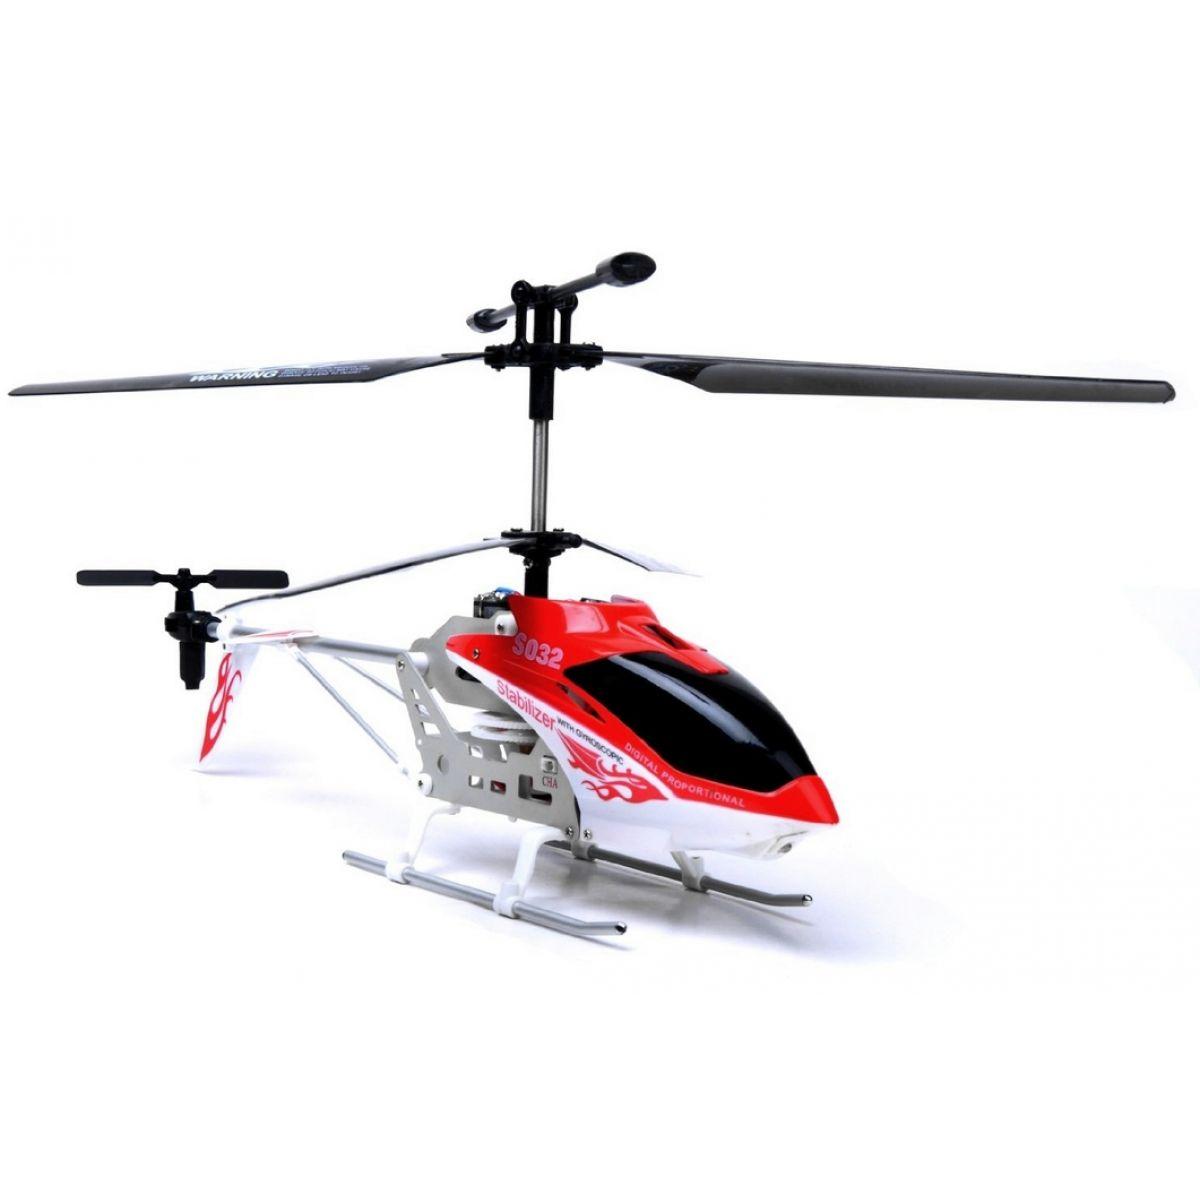 Syma RC Vrtulník 3-CH s GYRO 37cm